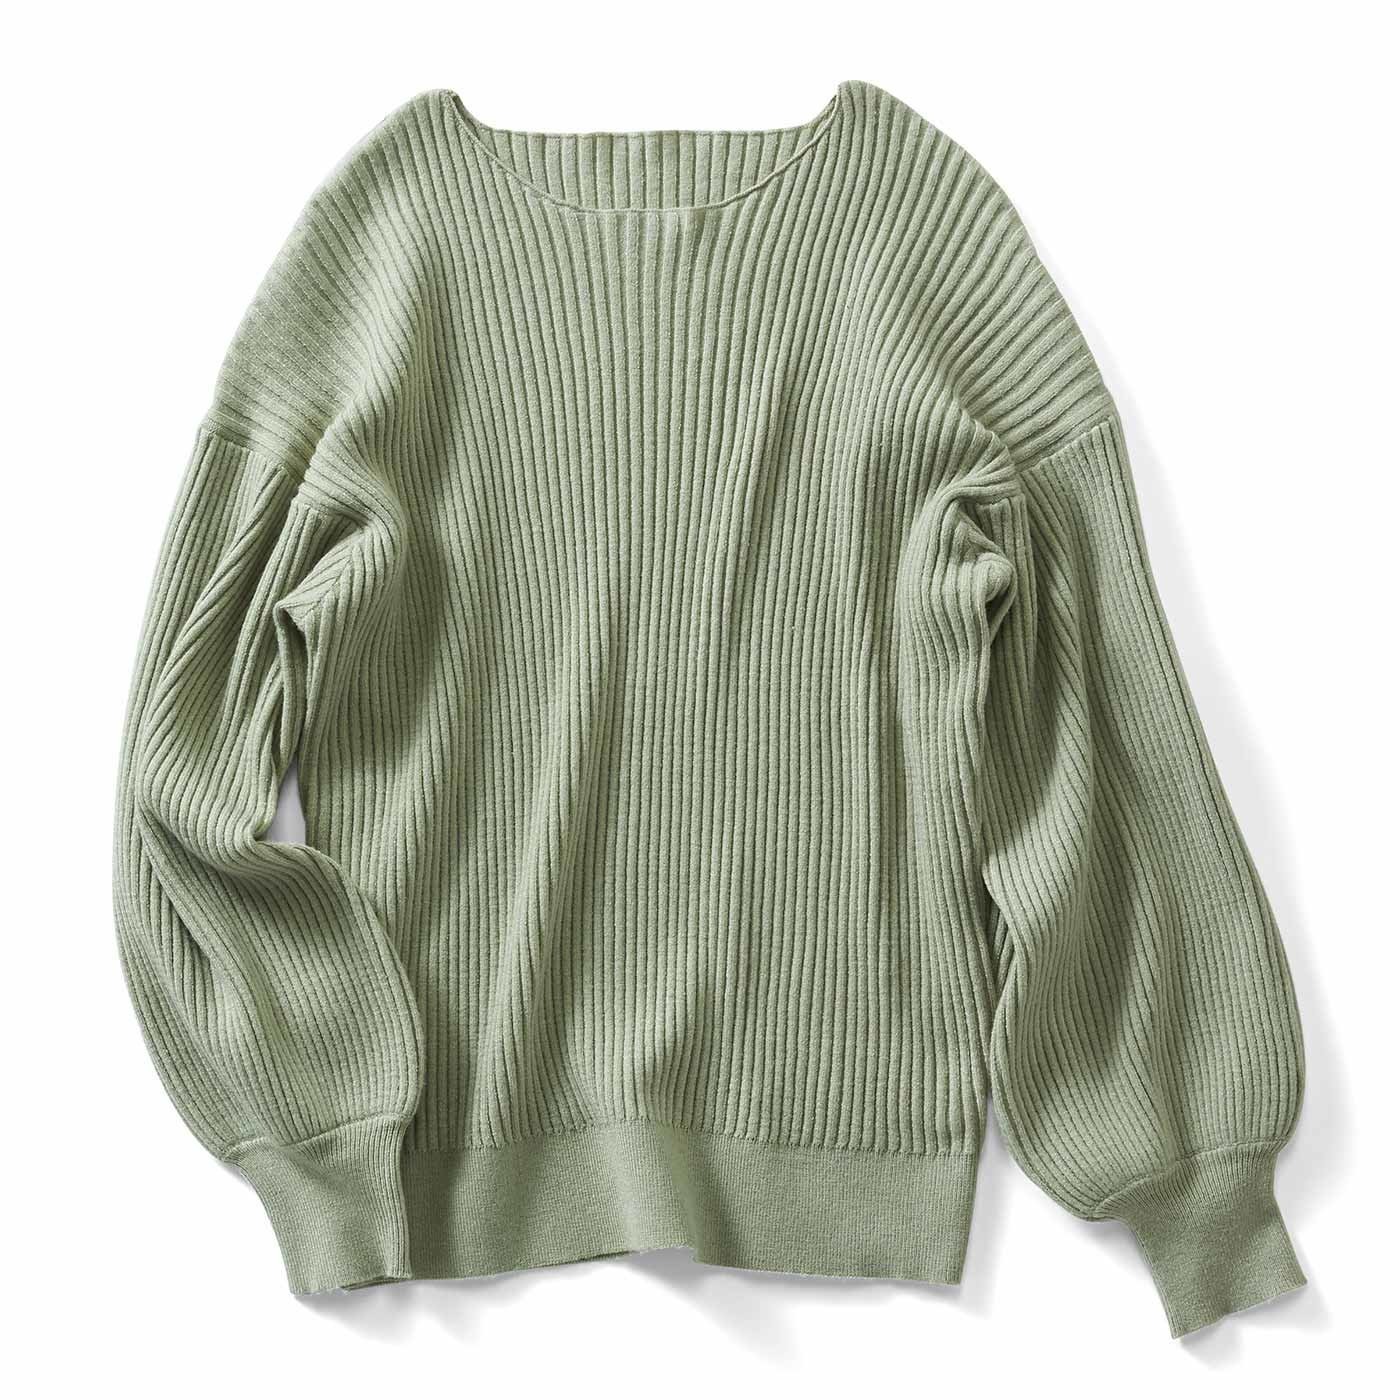 IEDIT[イディット] 帯電防止がうれしい もちとろ素材が心地よい ふんわり袖のフェミニンニット〈ピスタチオグリーン〉